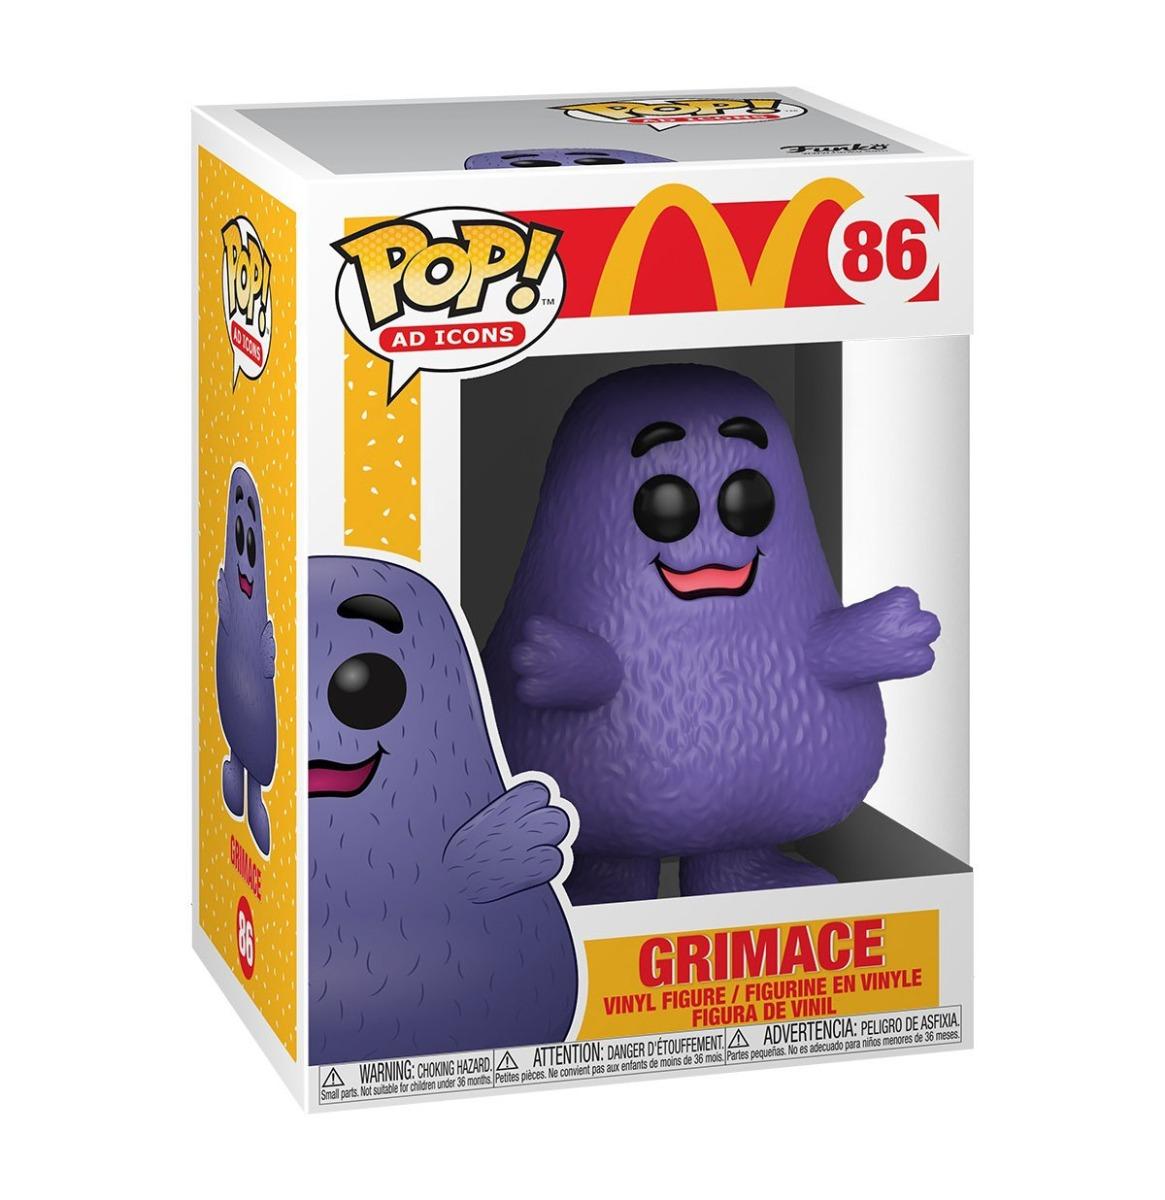 Pop! Ad Icons: McDonald's - Grimace